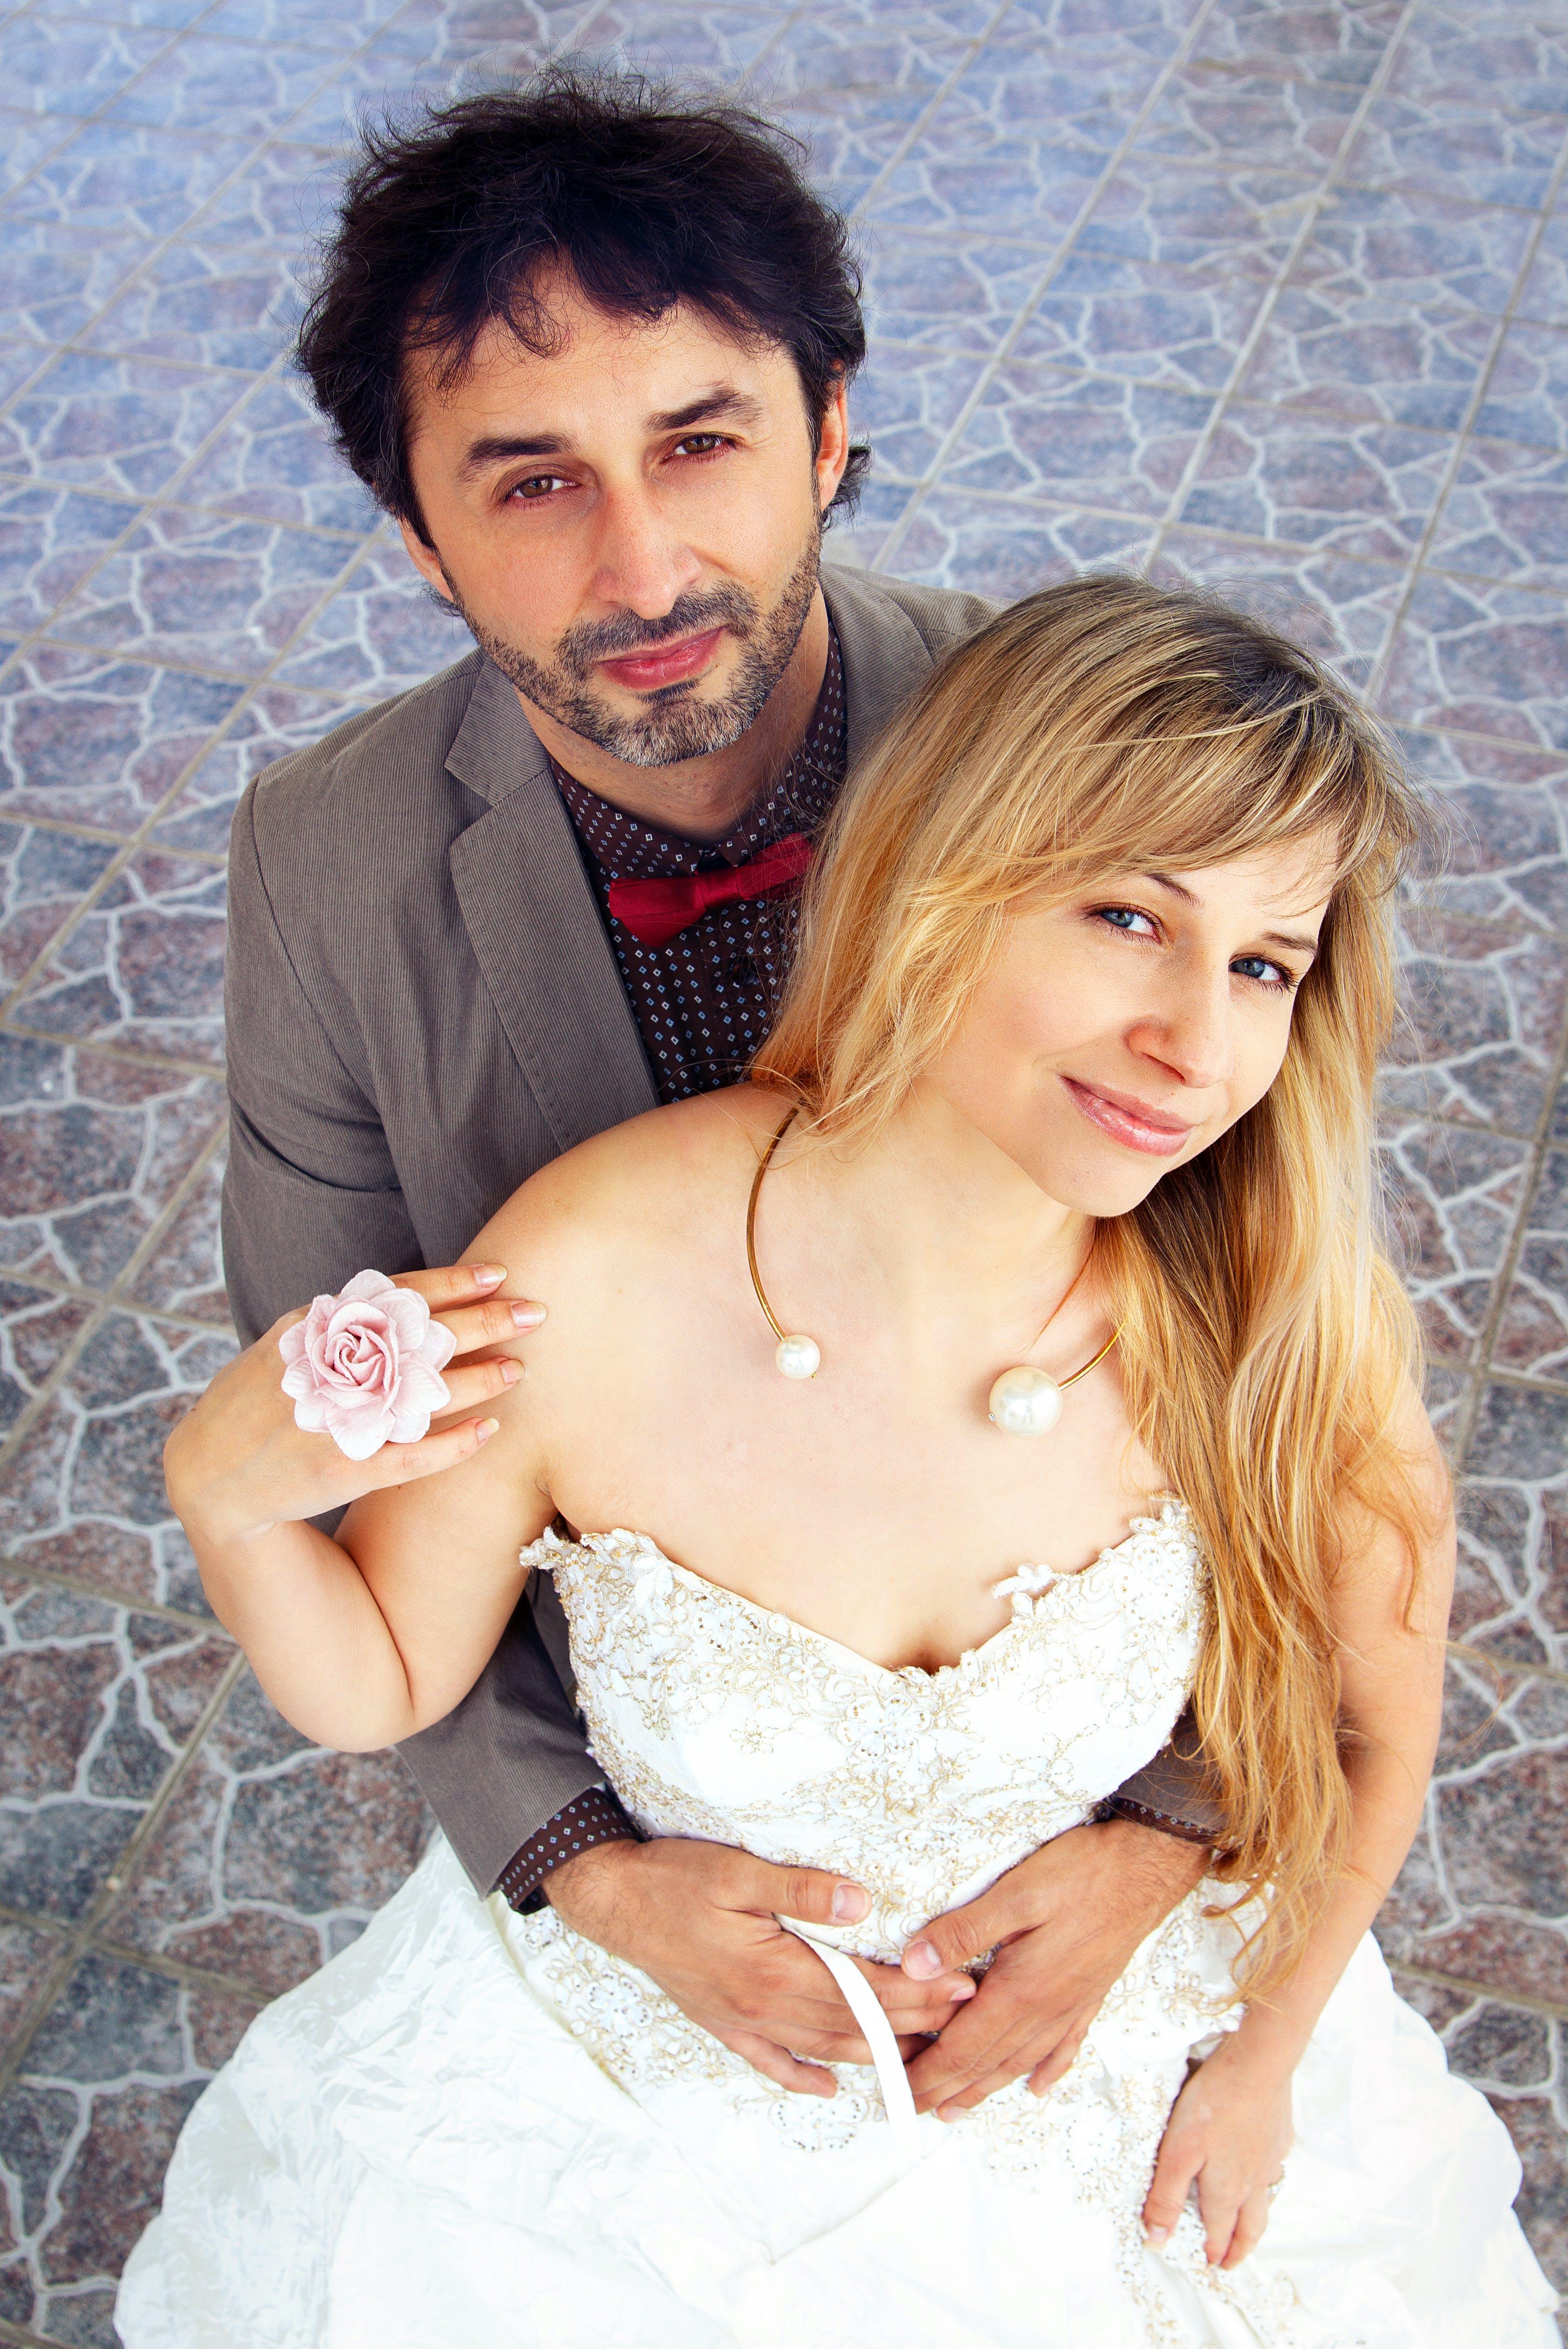 Kostenloses Stock Foto zu braut, bräutigam, frau, freude